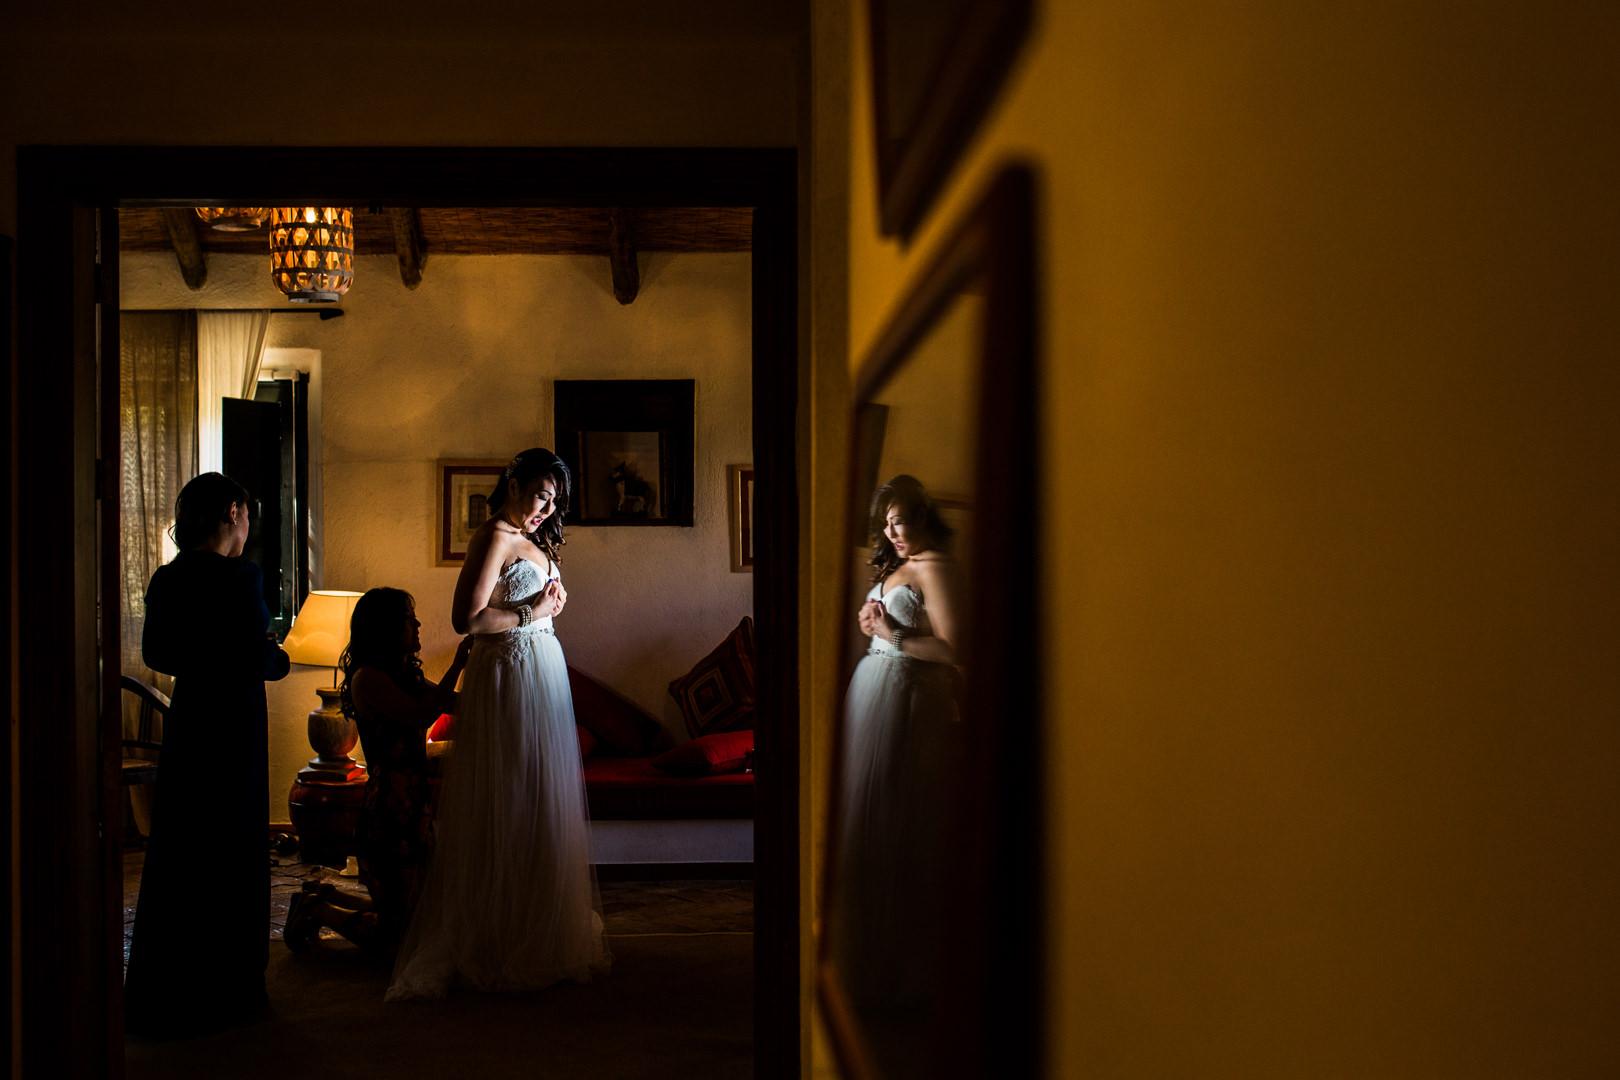 Boda-Hacienda-San-Rafael-Sevilla-engagement-Rafael-Torres-fotografo-bodas-sevilla-madrid-barcelona-wedding-photographer--36.jpg